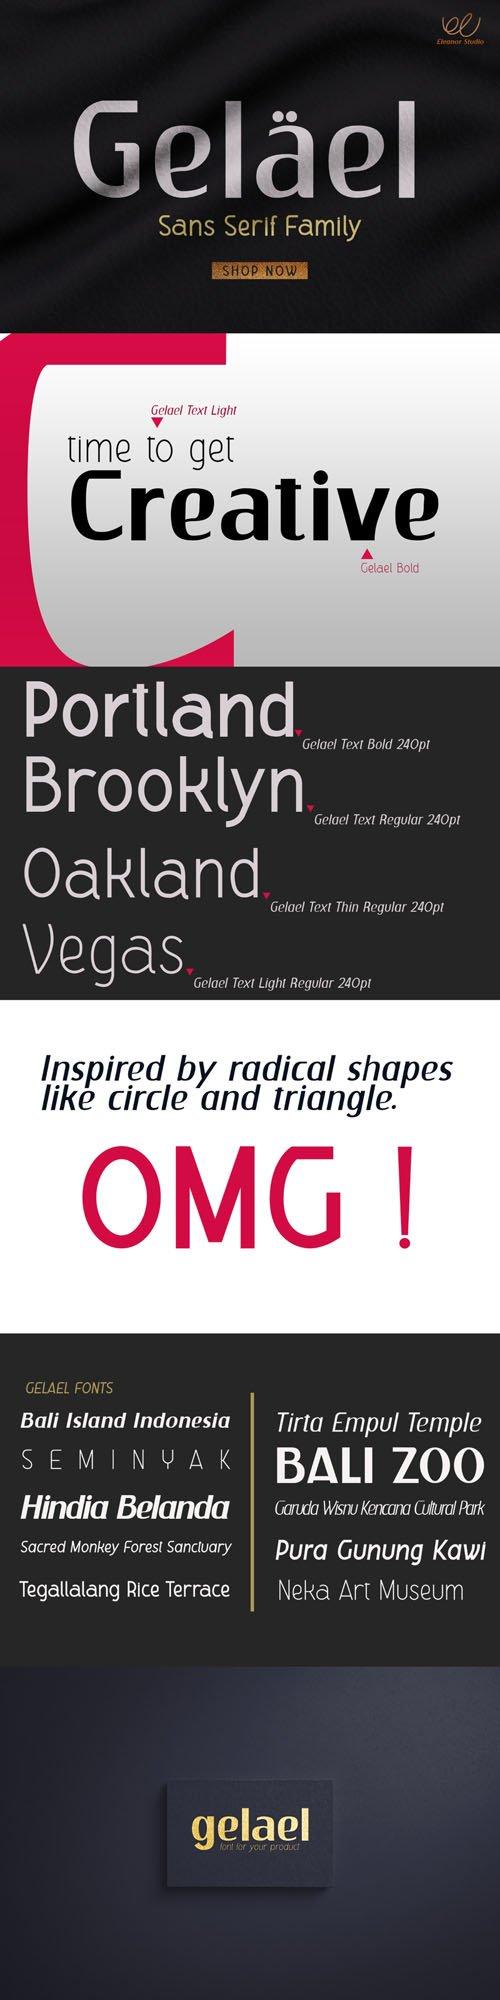 Gelael - Creative Sans Serif Font Family [2-Weights]